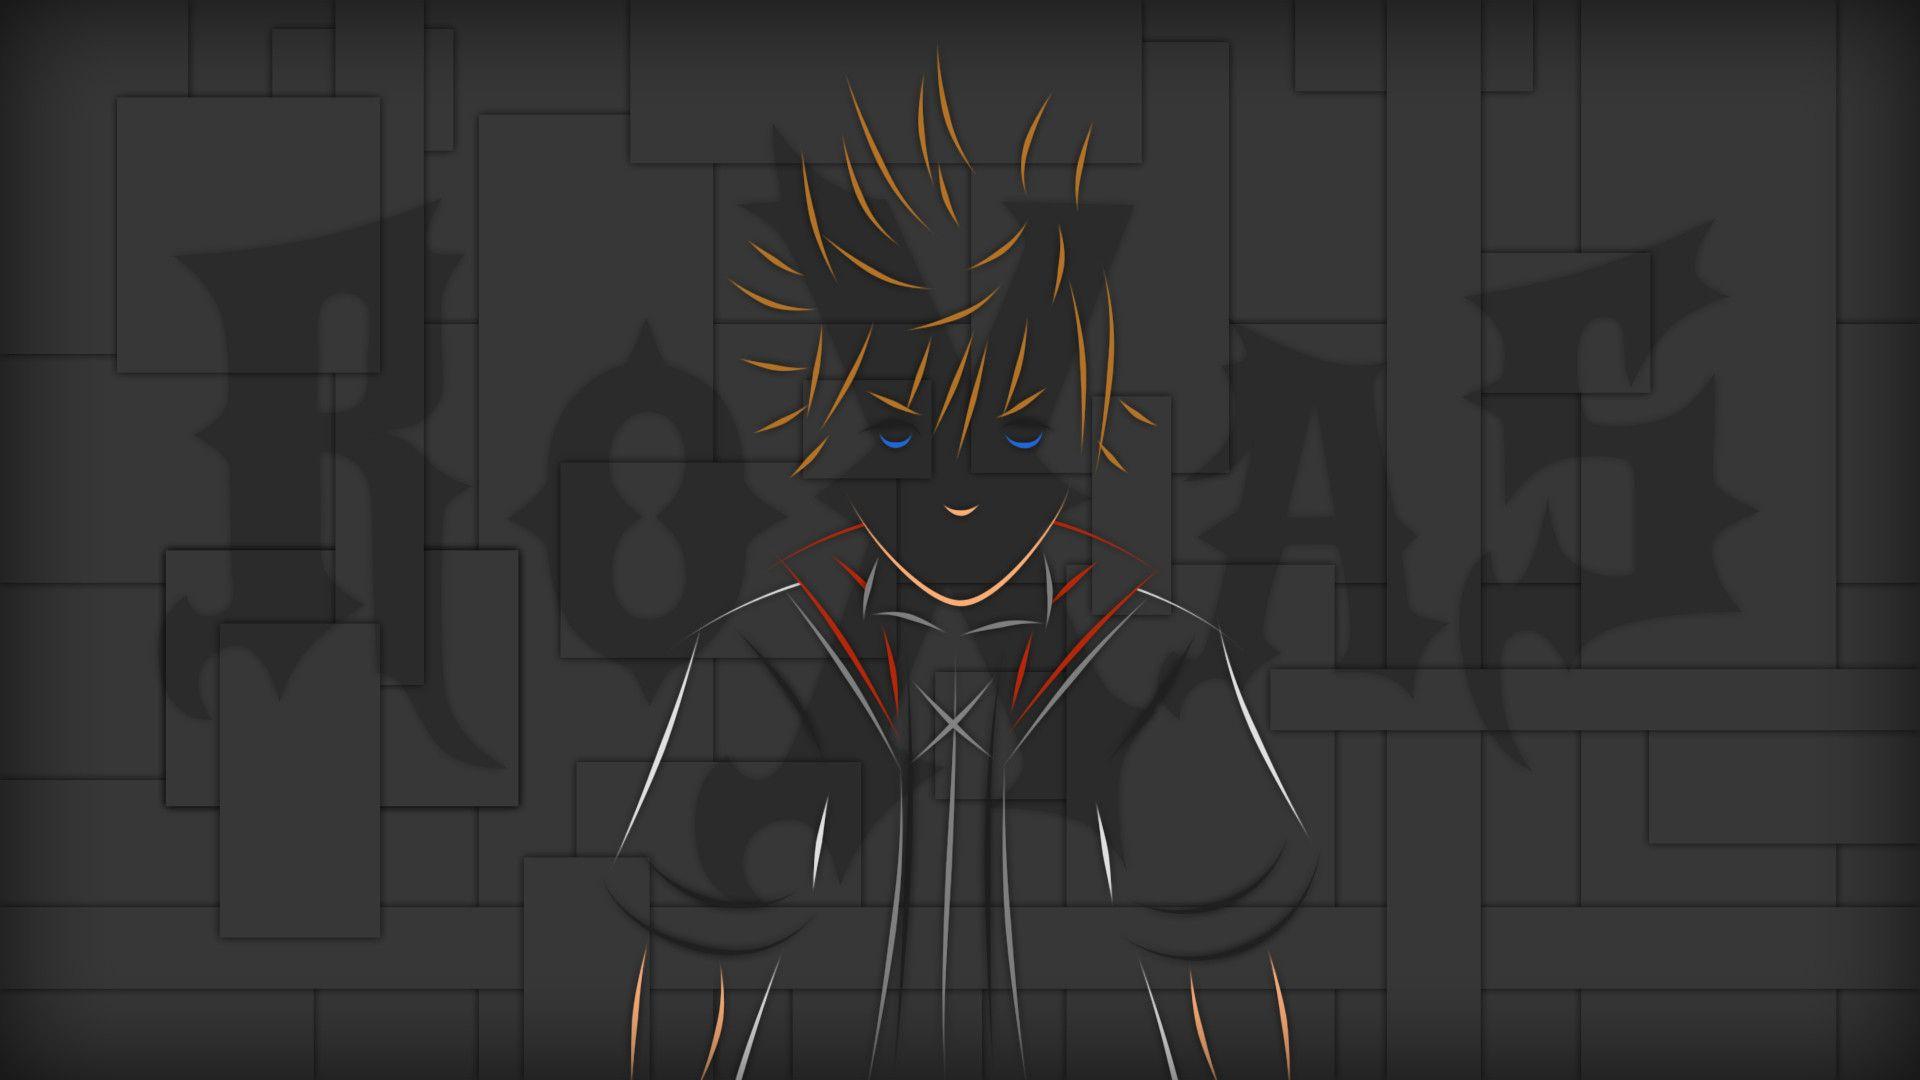 Kingdom Hearts Roxas Wallpapers High Quality Roxas Kingdom Hearts Kingdom Hearts Kingdom